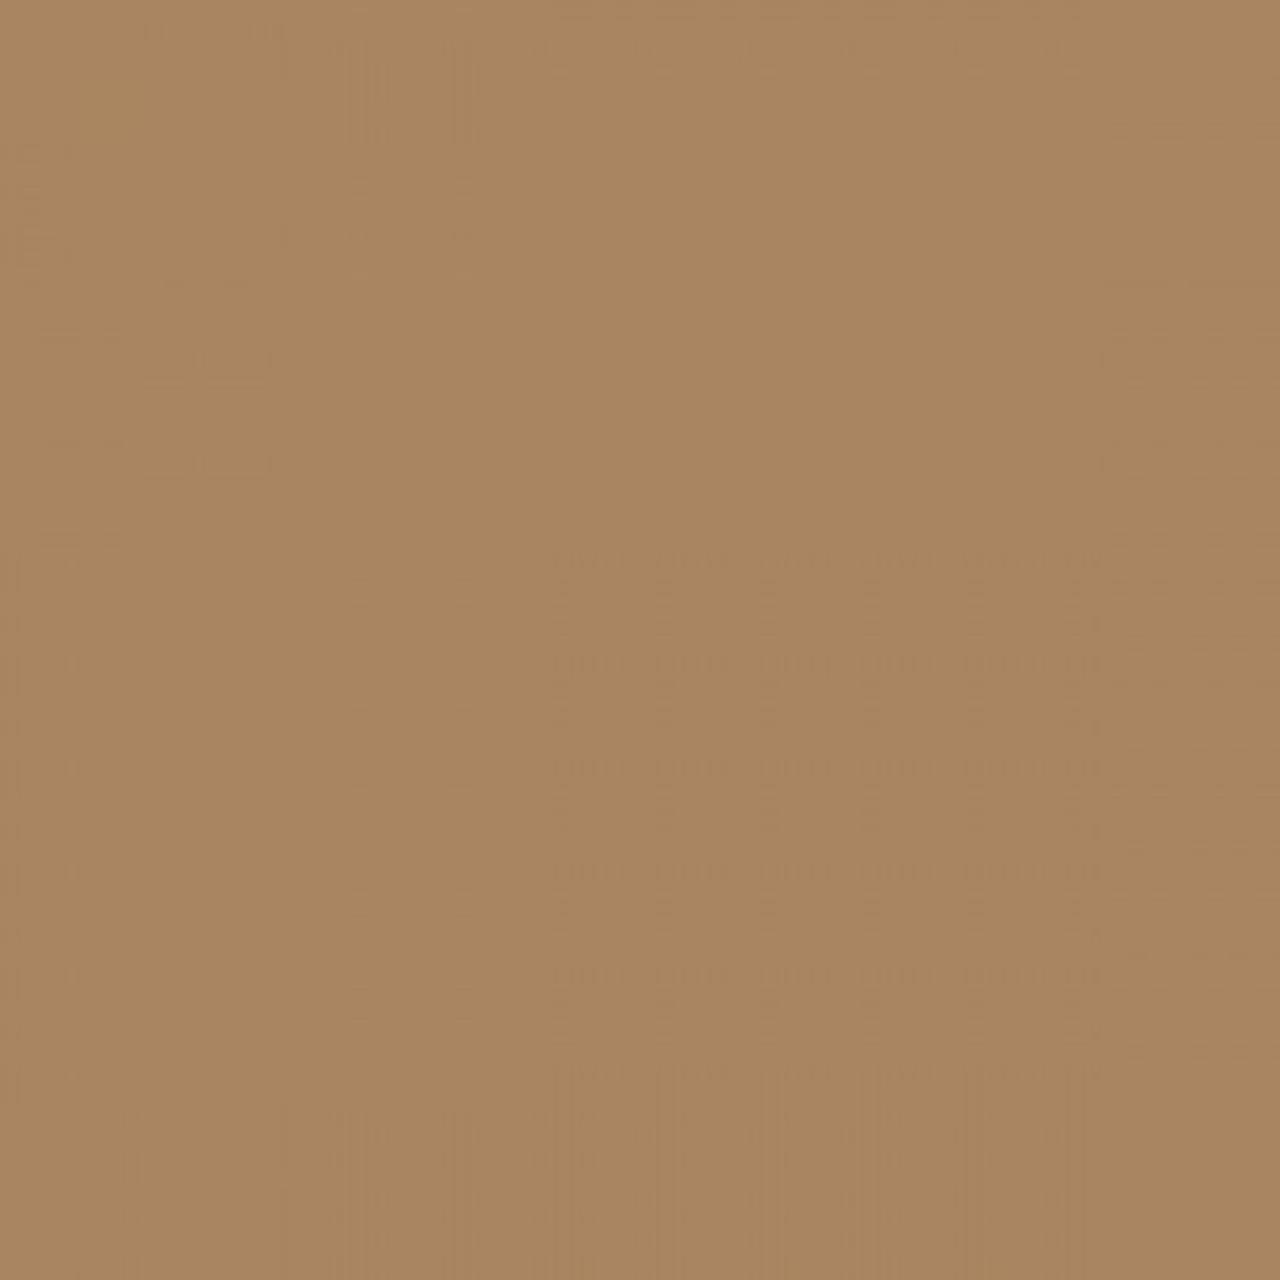 Mixol Universal Tints Oxide Terra Brown #21